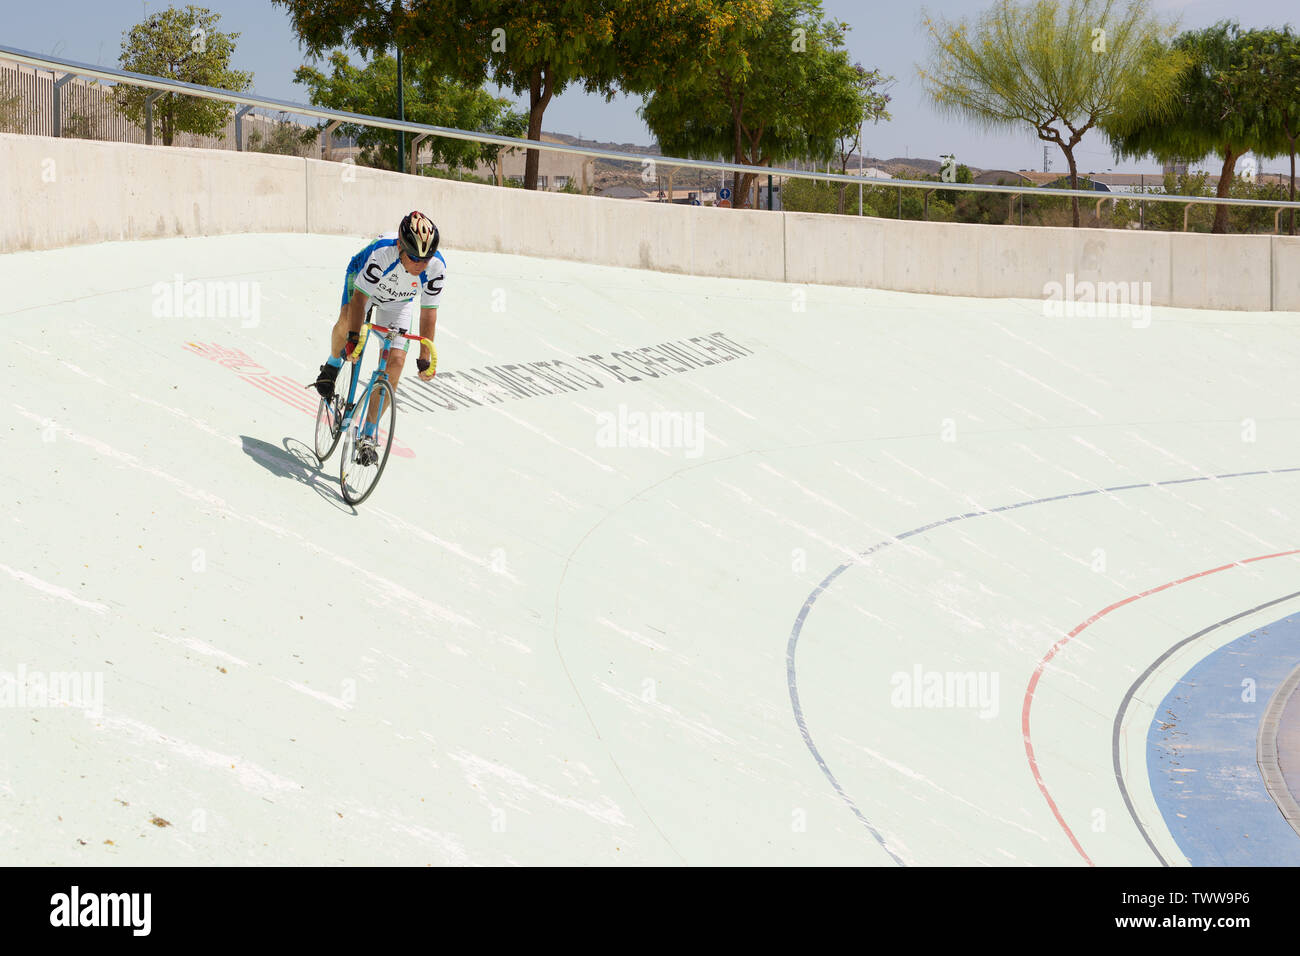 Senioren auf einem Fahrrad um ein velodrom Stockbild